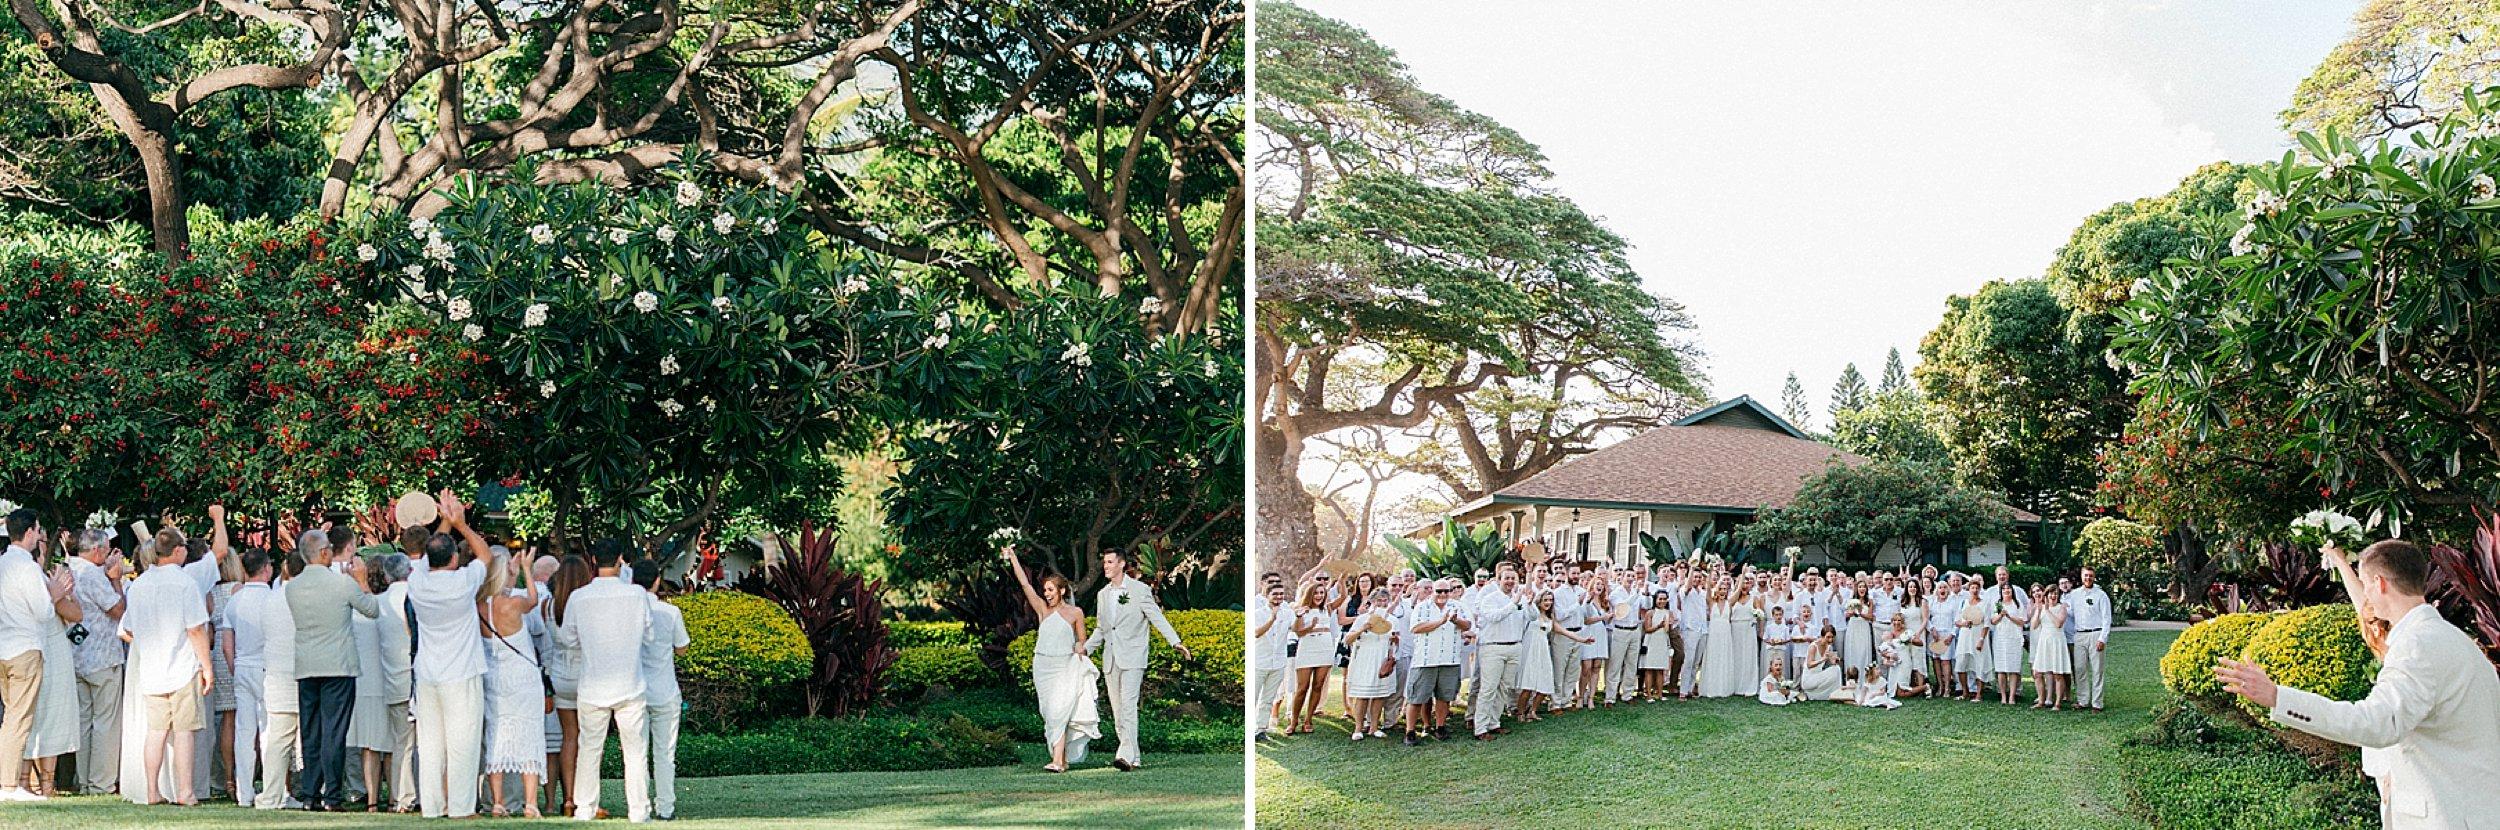 maui-wedding-at-olowalu-plantation-house_0075.jpg